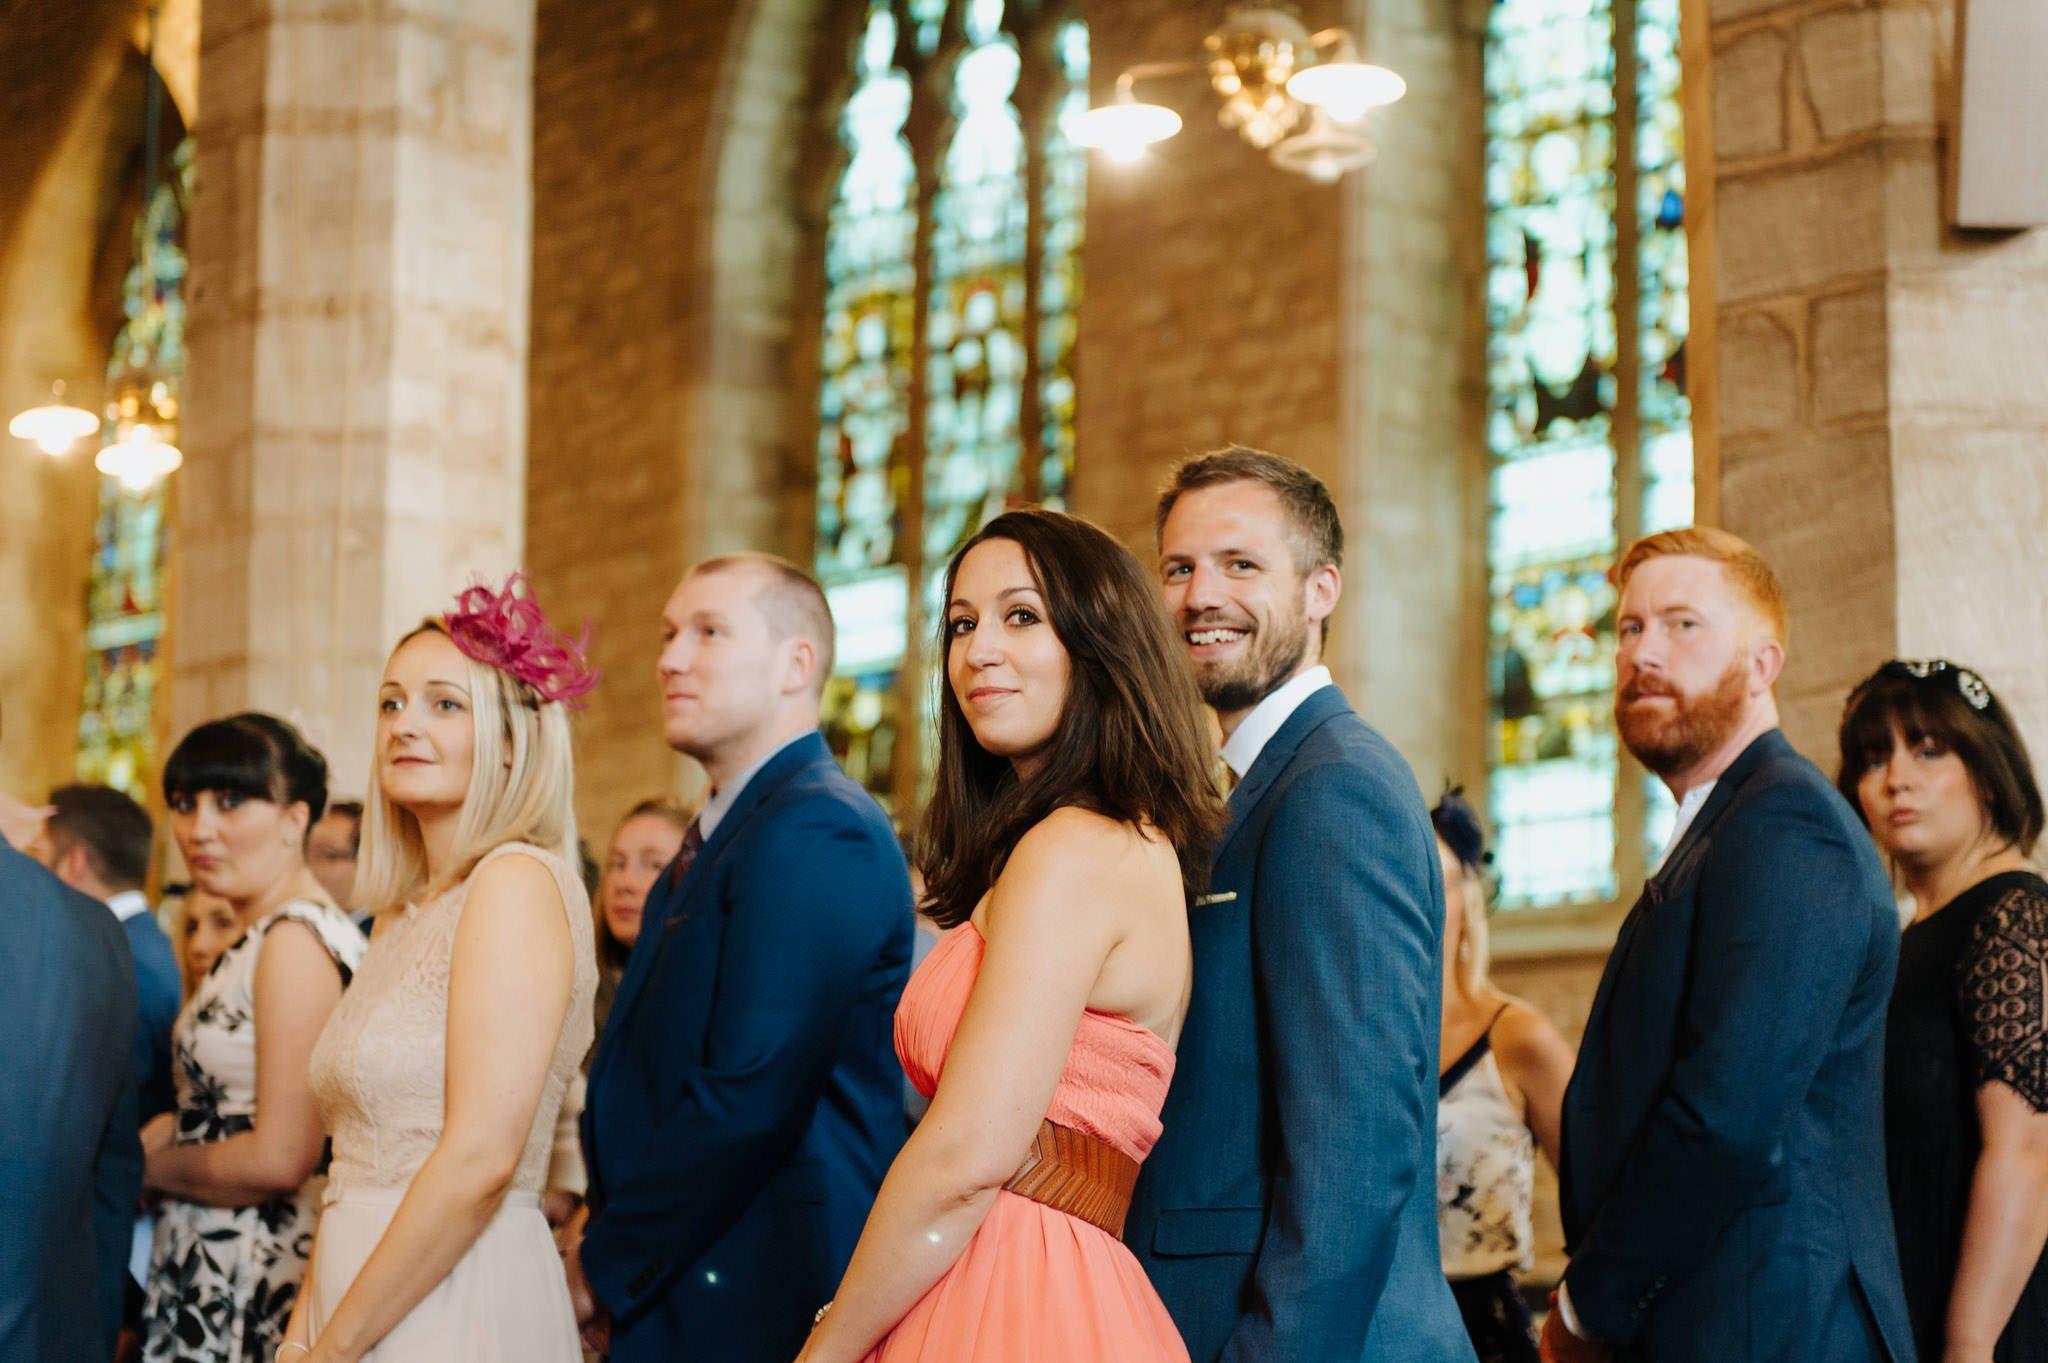 Eastnor Castle wedding photographer Herefordshire, West Midlands - Sarah + Dean 25